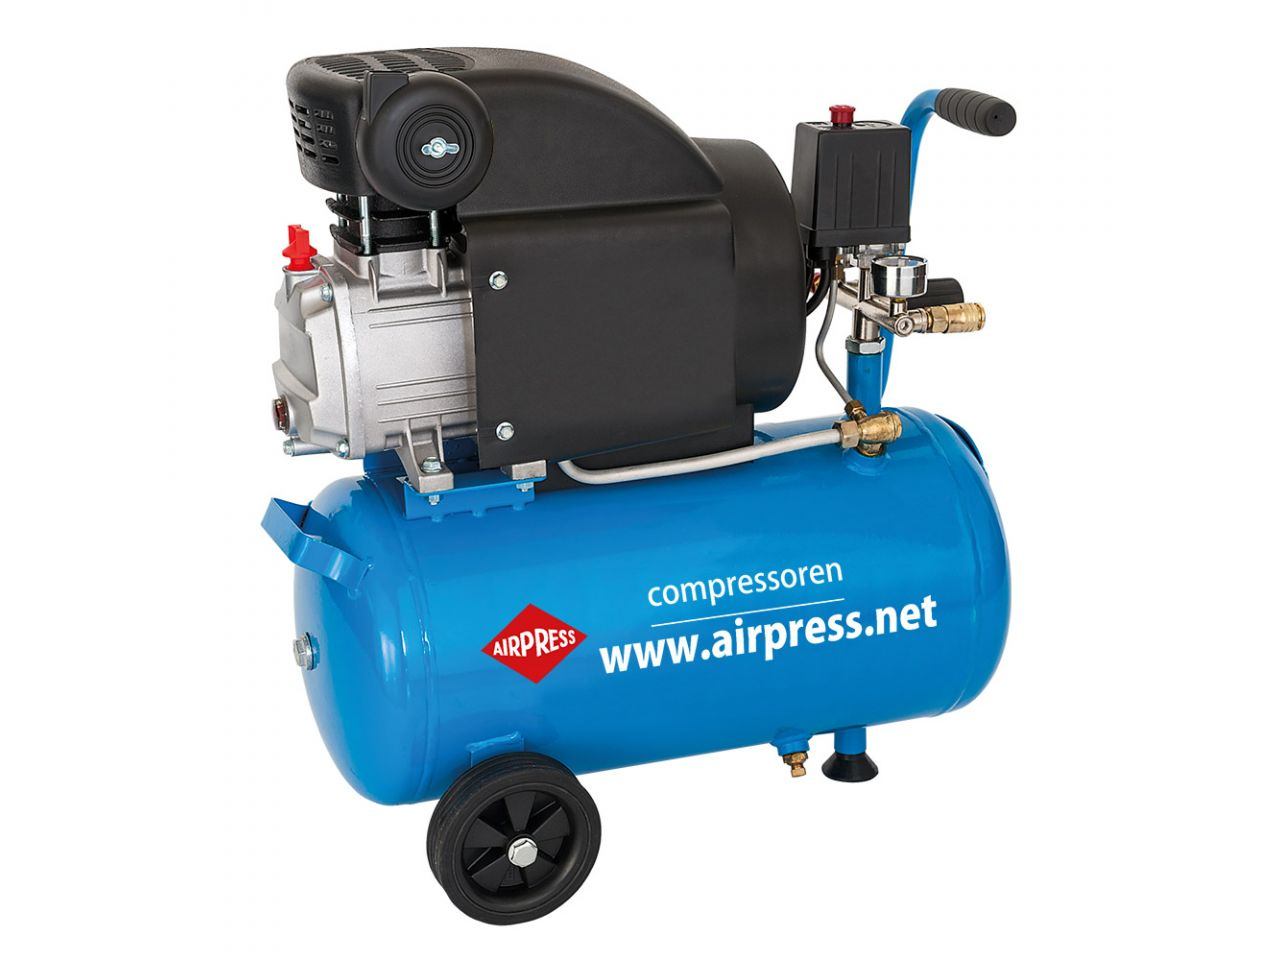 Airpress Compressor HL 310-25